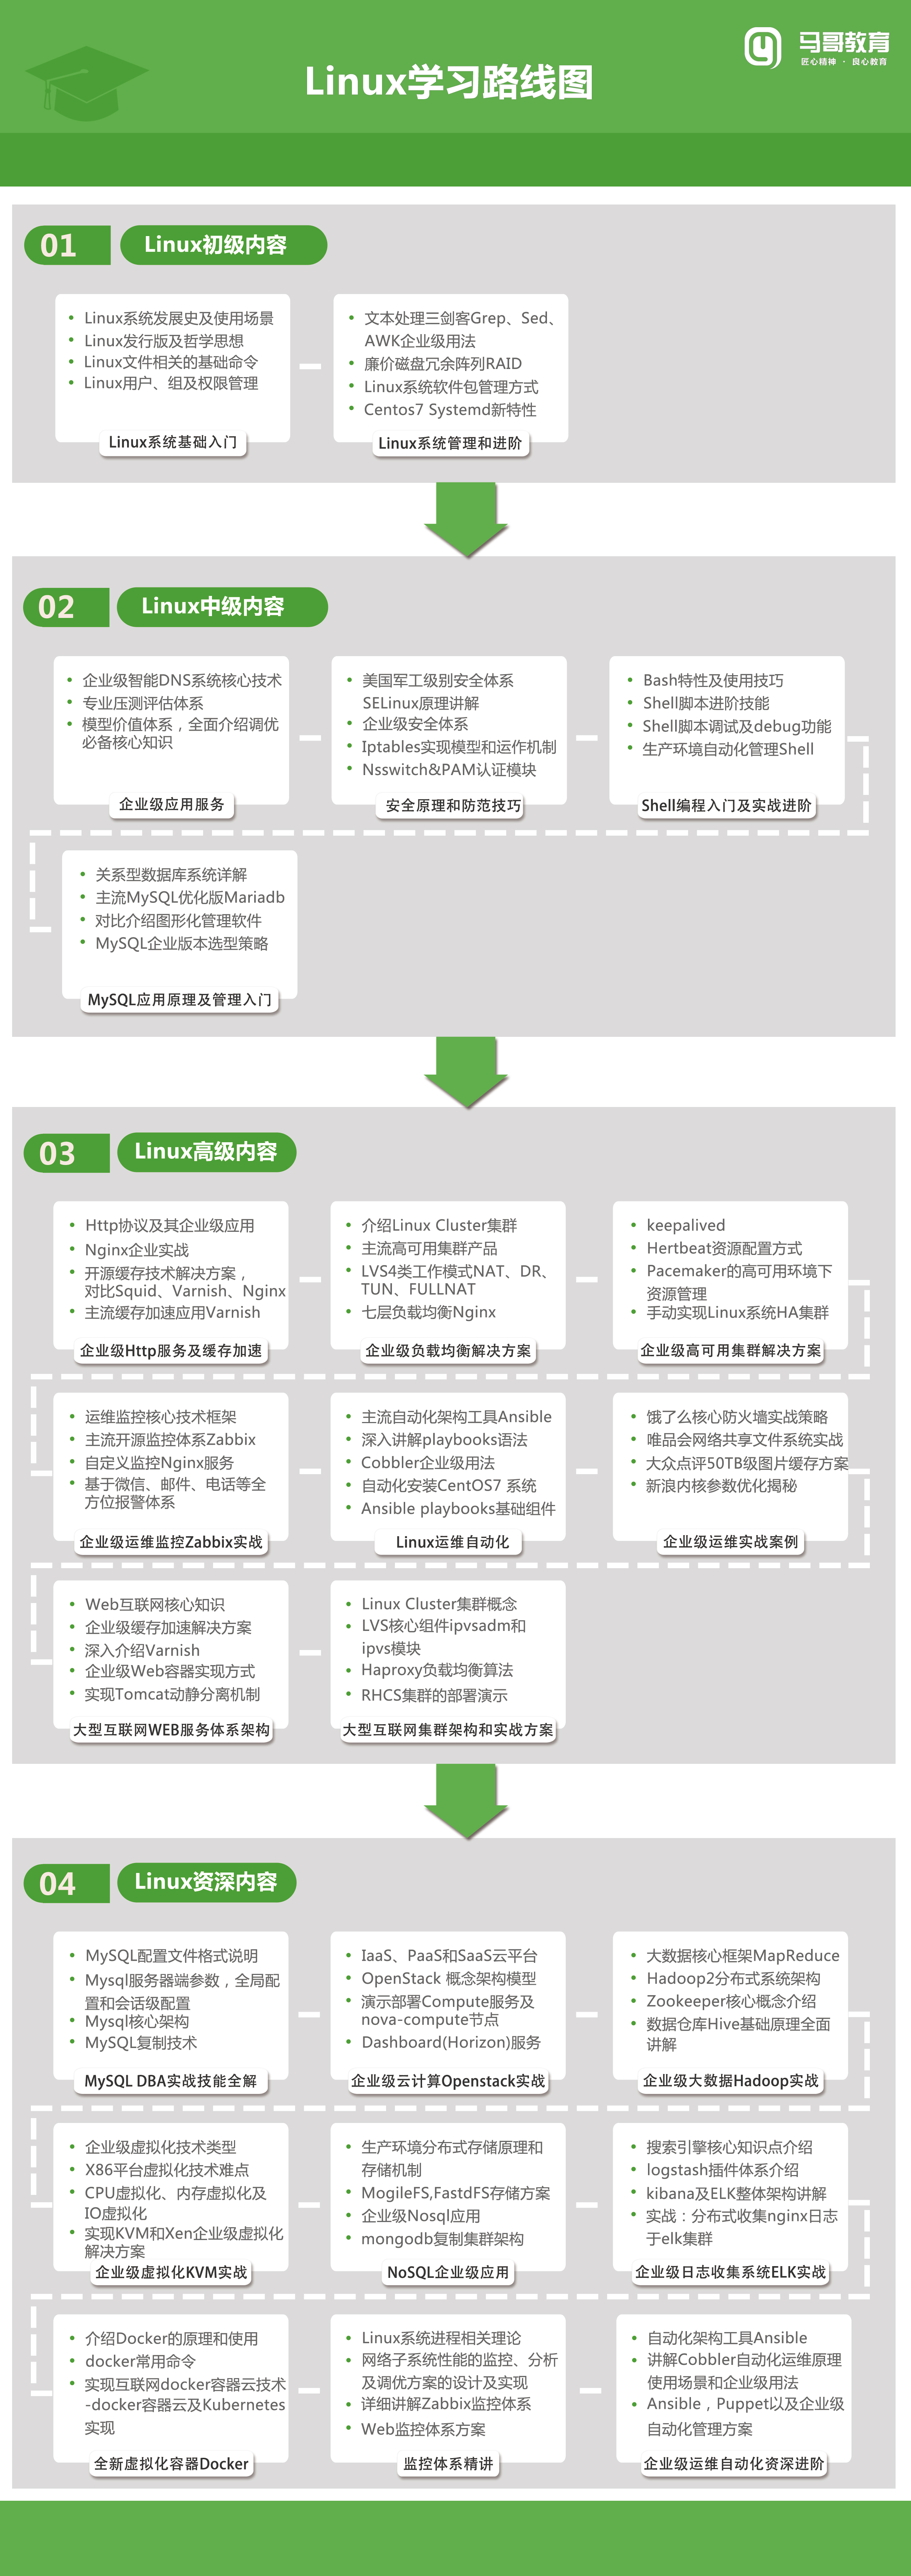 Linux路线图